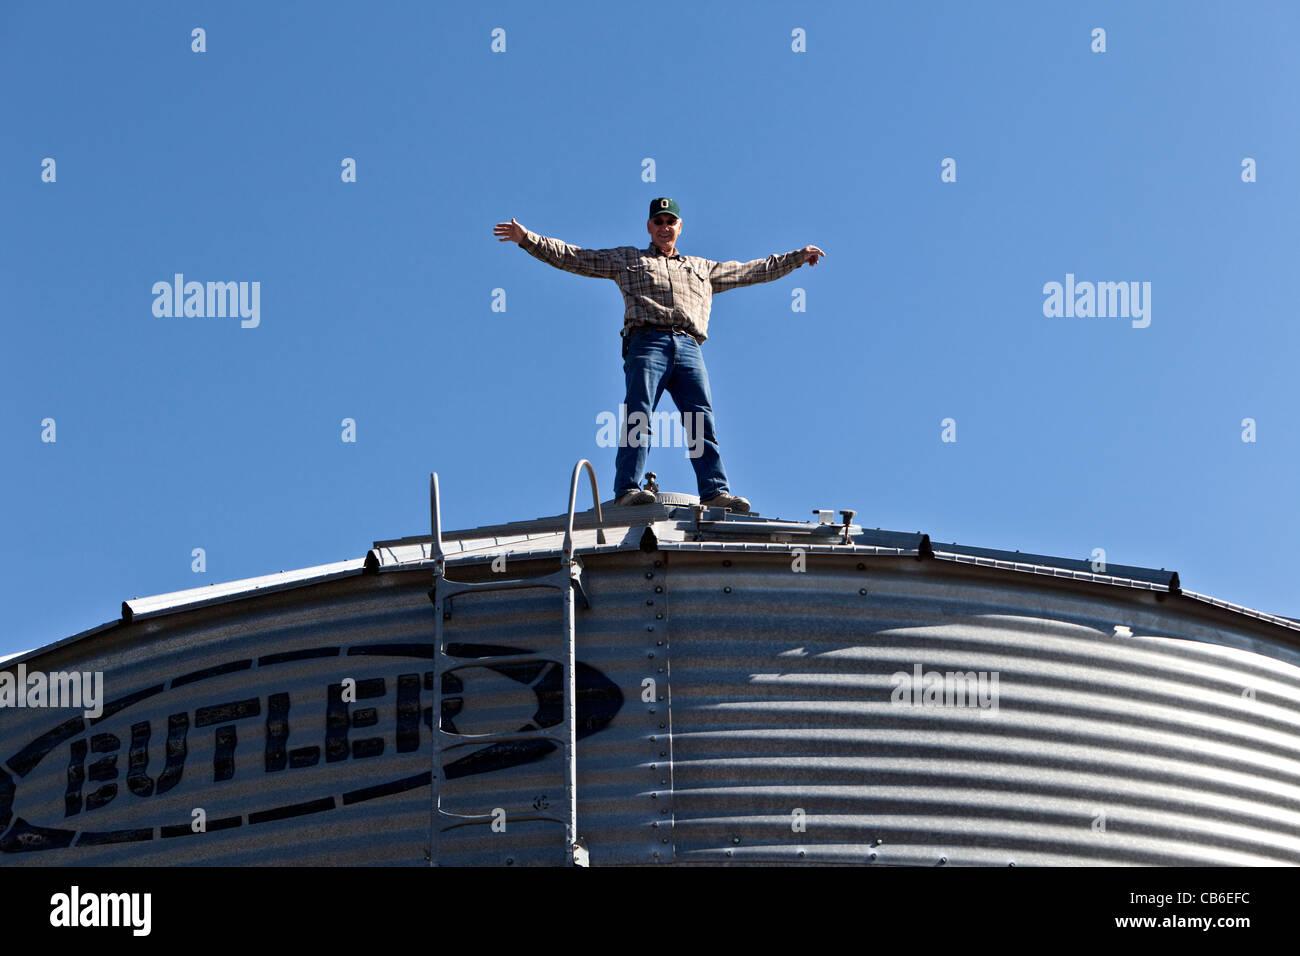 Wheat farmer standing on roof, grain  storage bin. - Stock Image